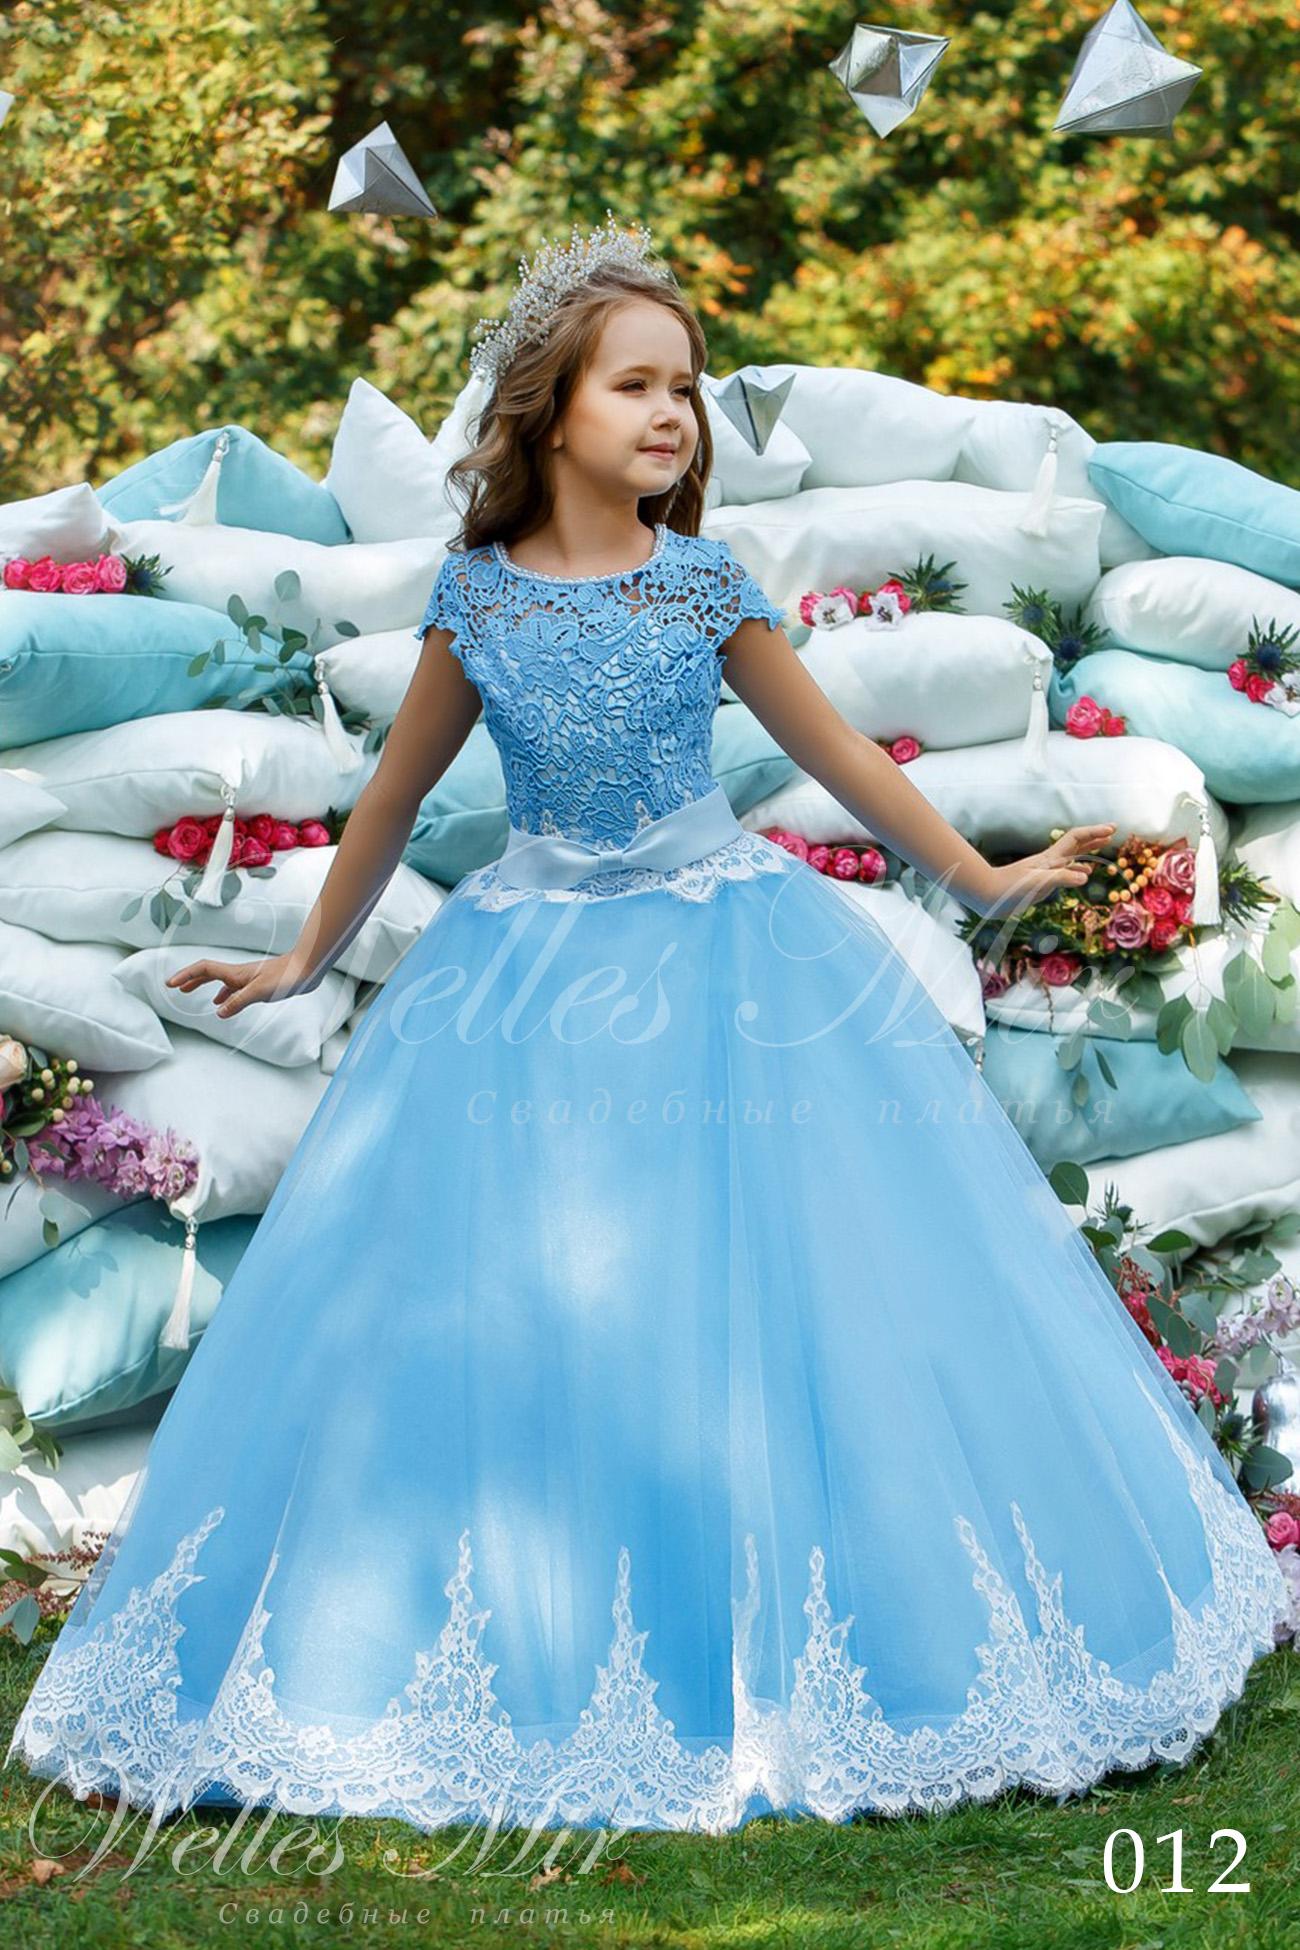 Детские платья Kids Deluxe Collection 2018 - 012